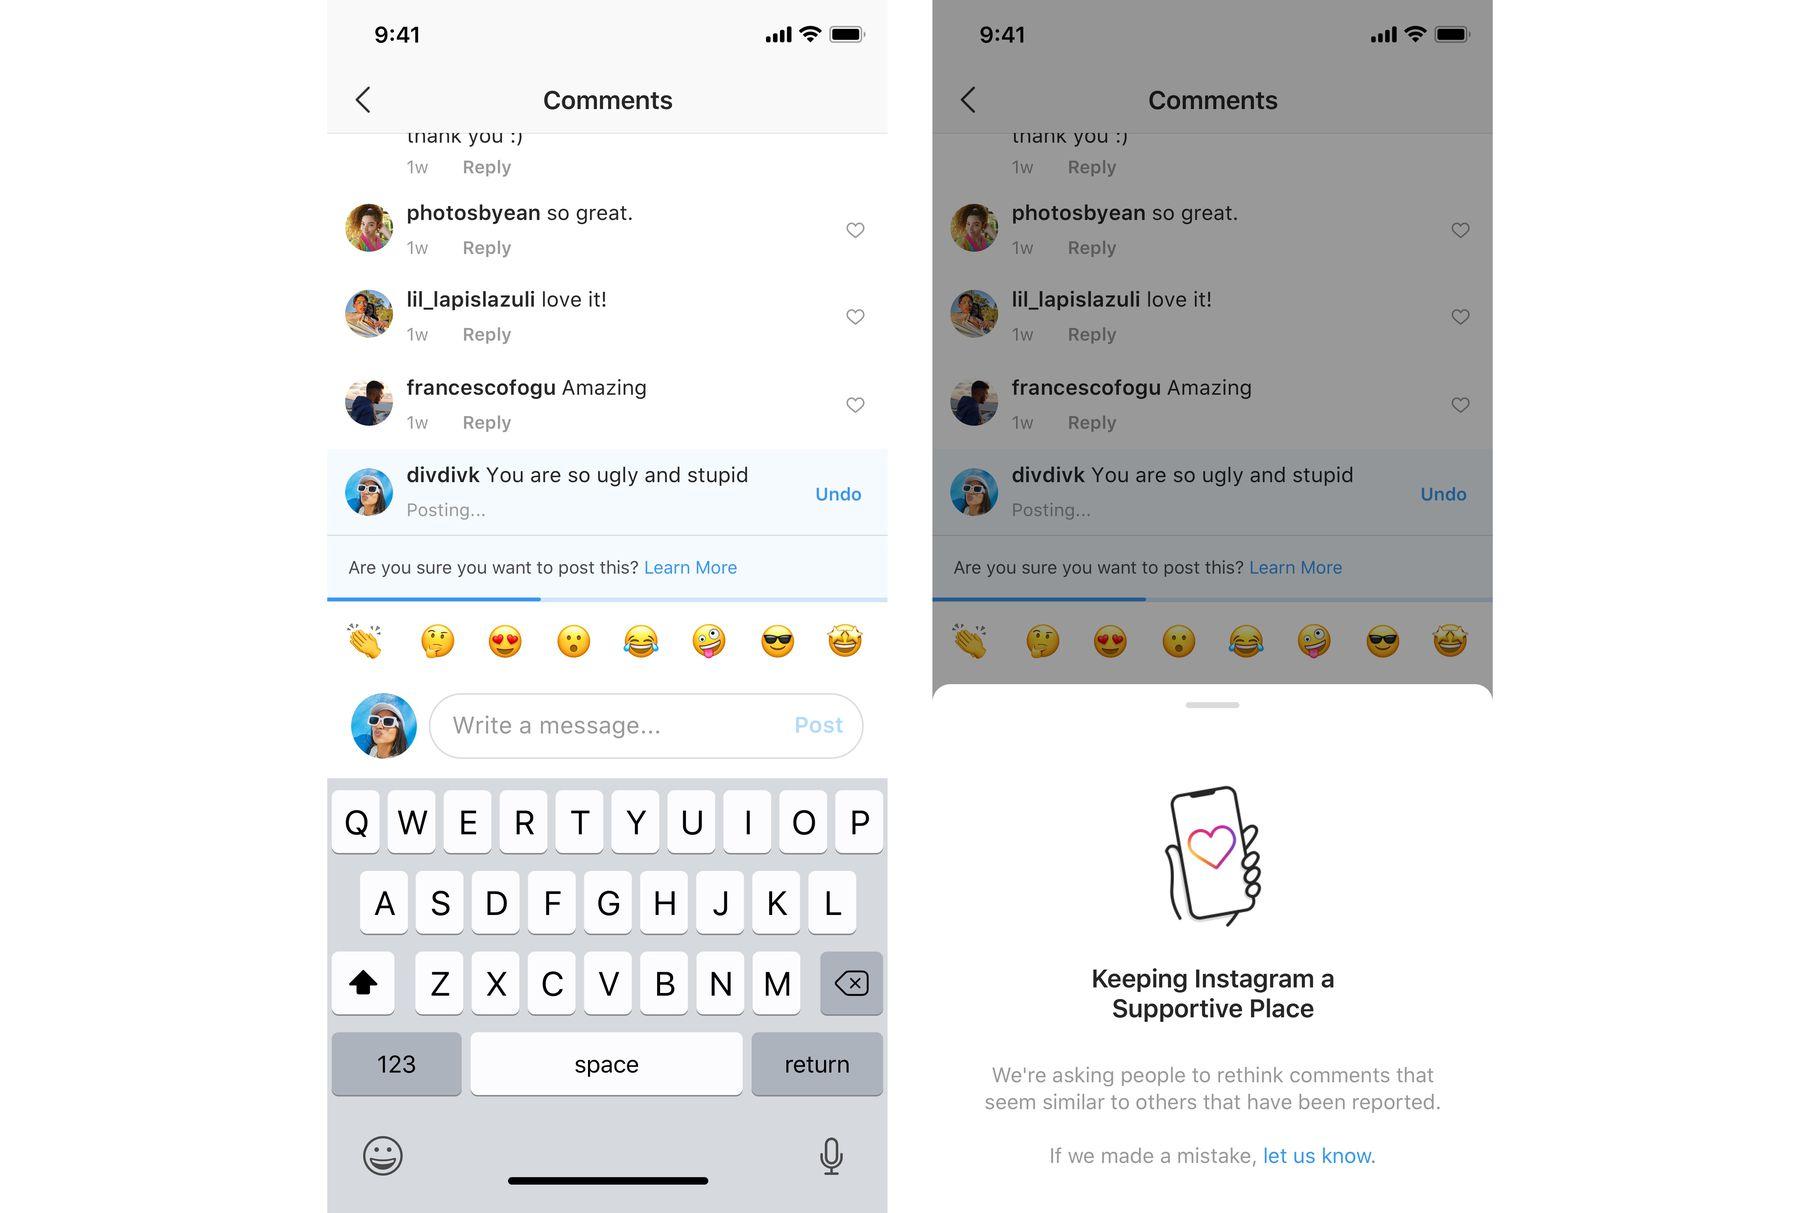 Instagram testerà una funzione estremamente utile per difendersi dal cyberbullismo 2